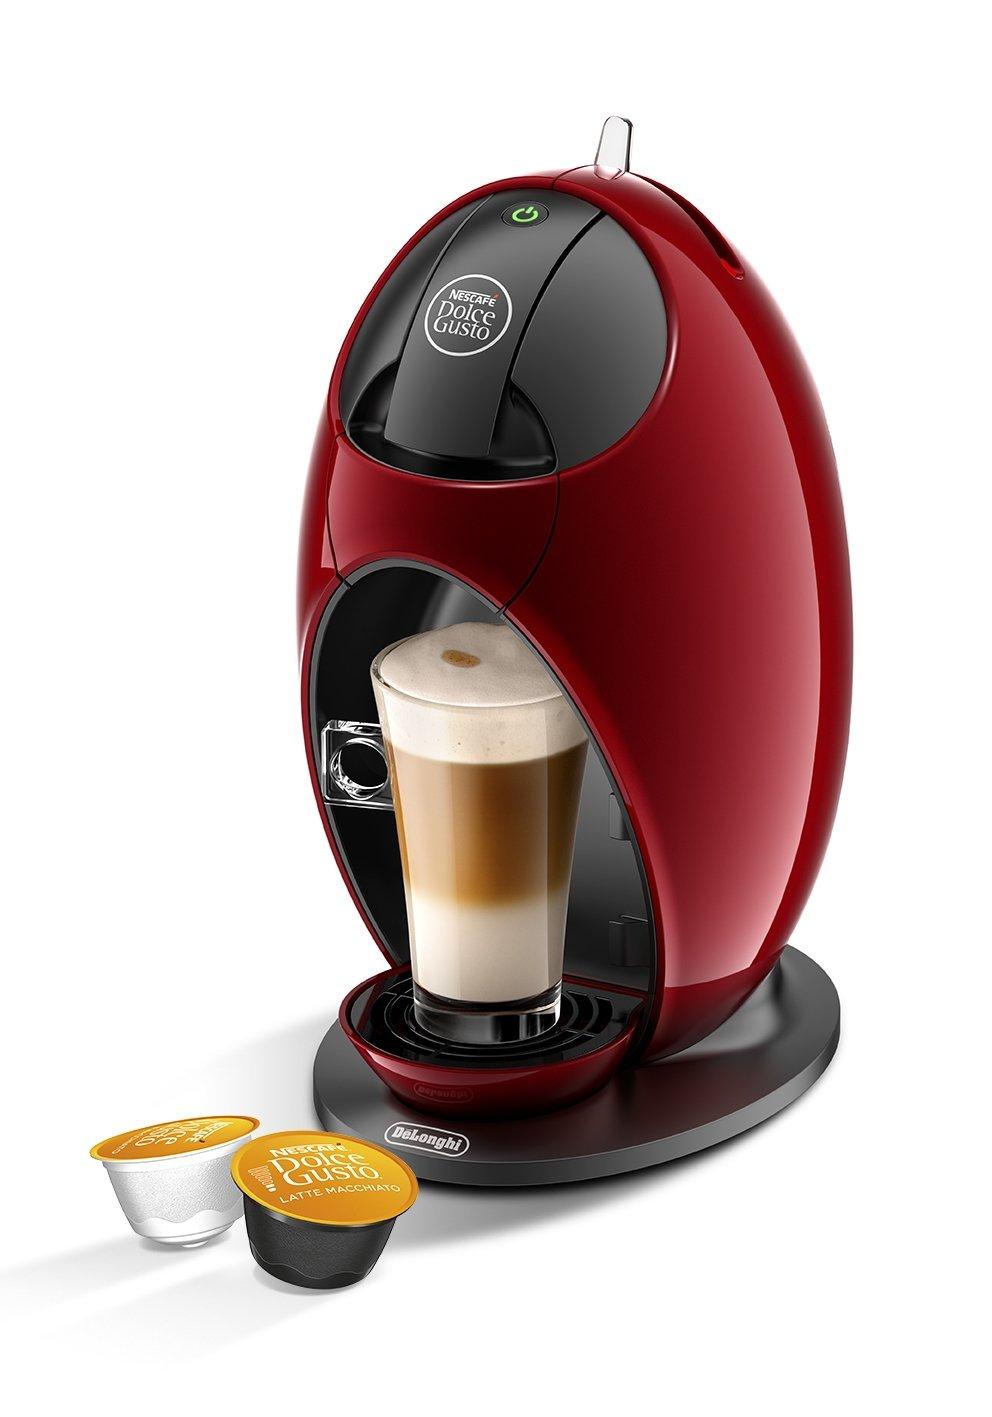 de 39 longhi nescaf dolce gusto jovia manual coffee machine. Black Bedroom Furniture Sets. Home Design Ideas